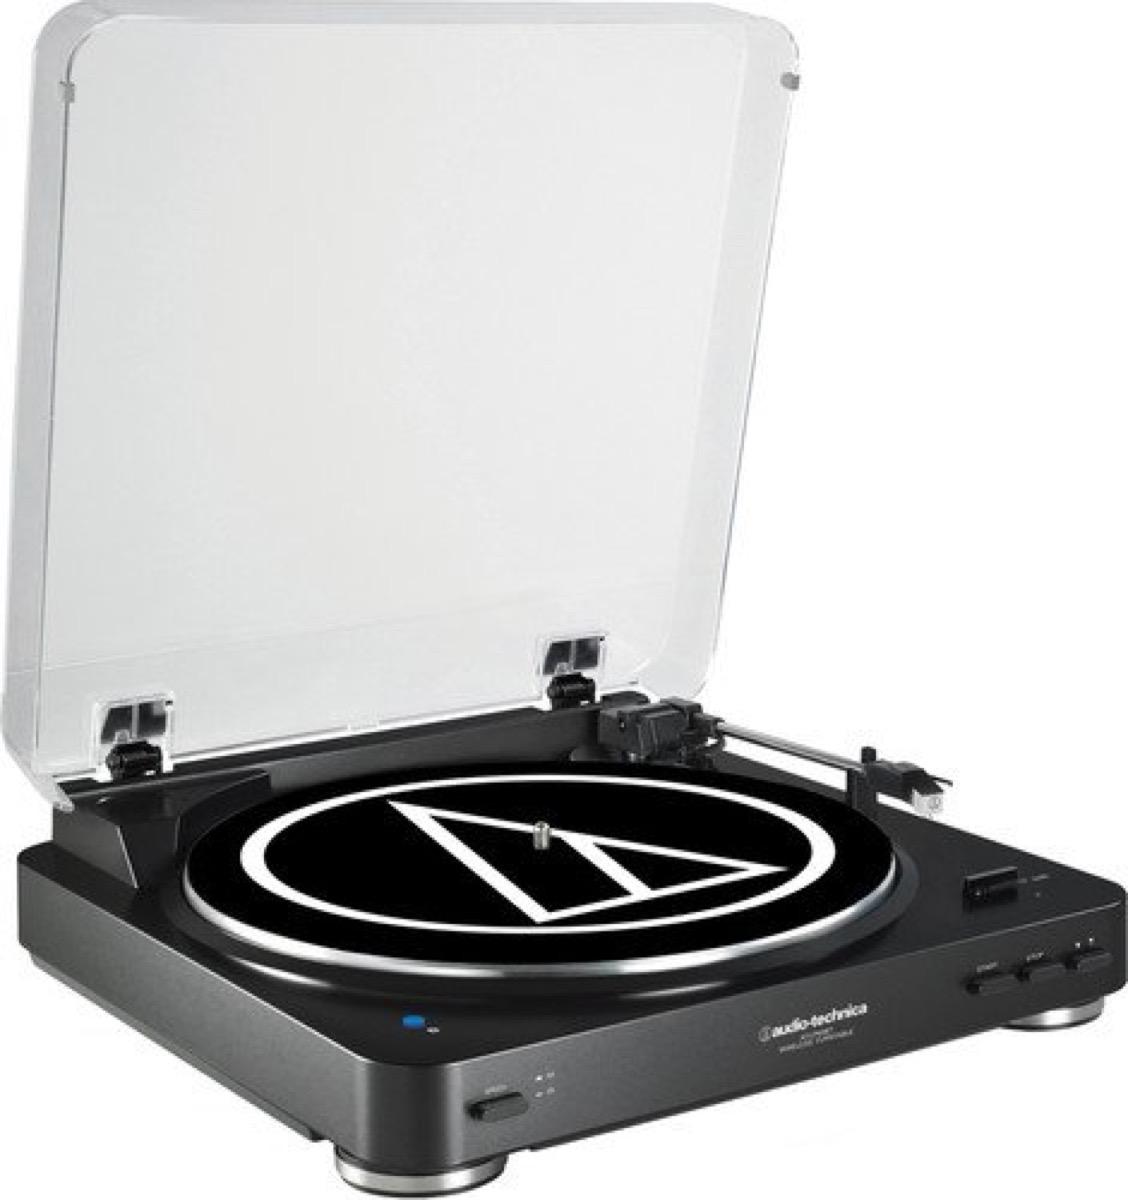 amazon audio-technica turntable, best boyfriend gifts